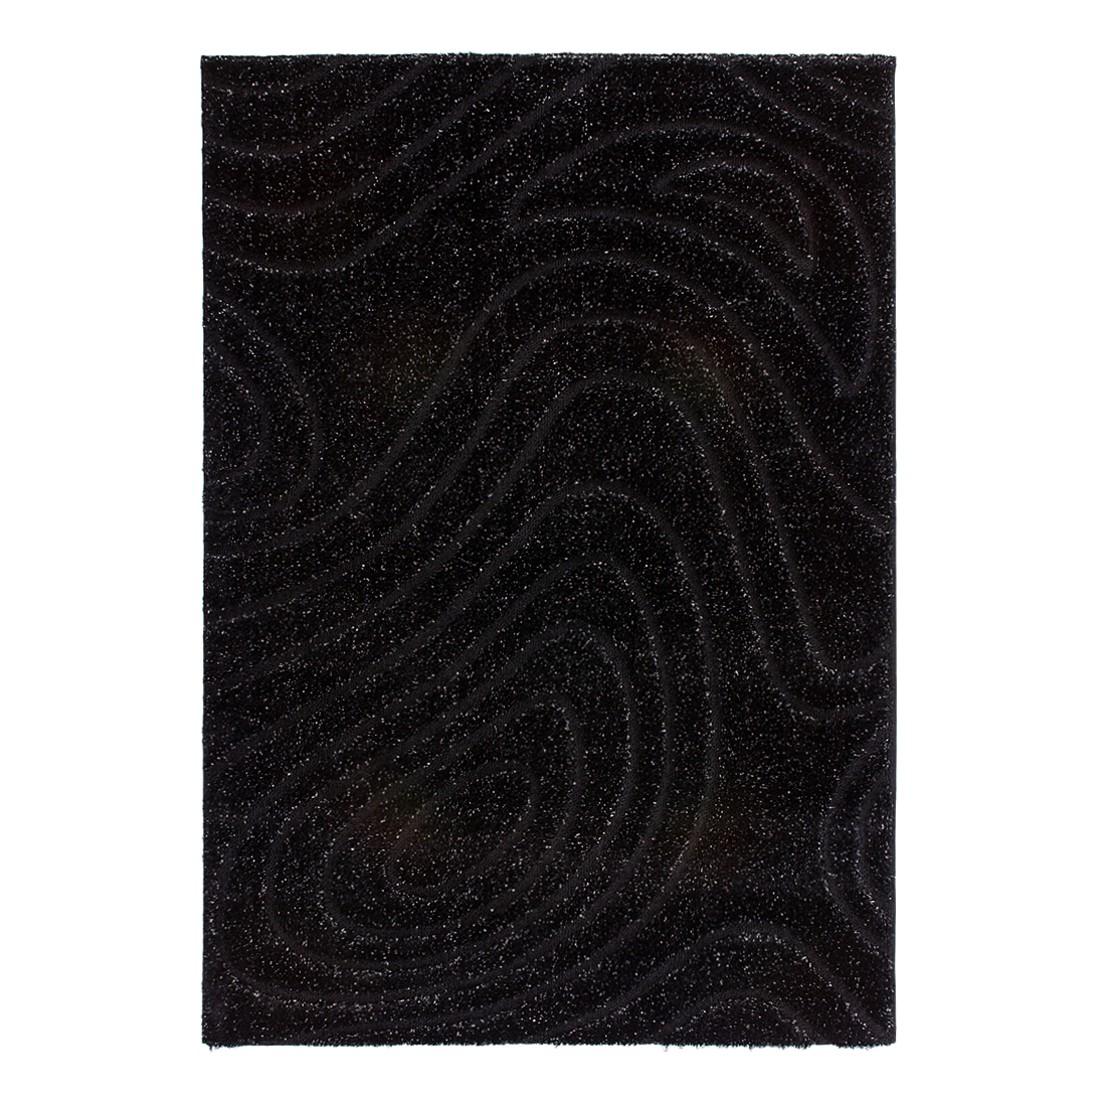 Teppich China – Chongqing – Schwarz – 200 x 290 cm, Kayoom günstig